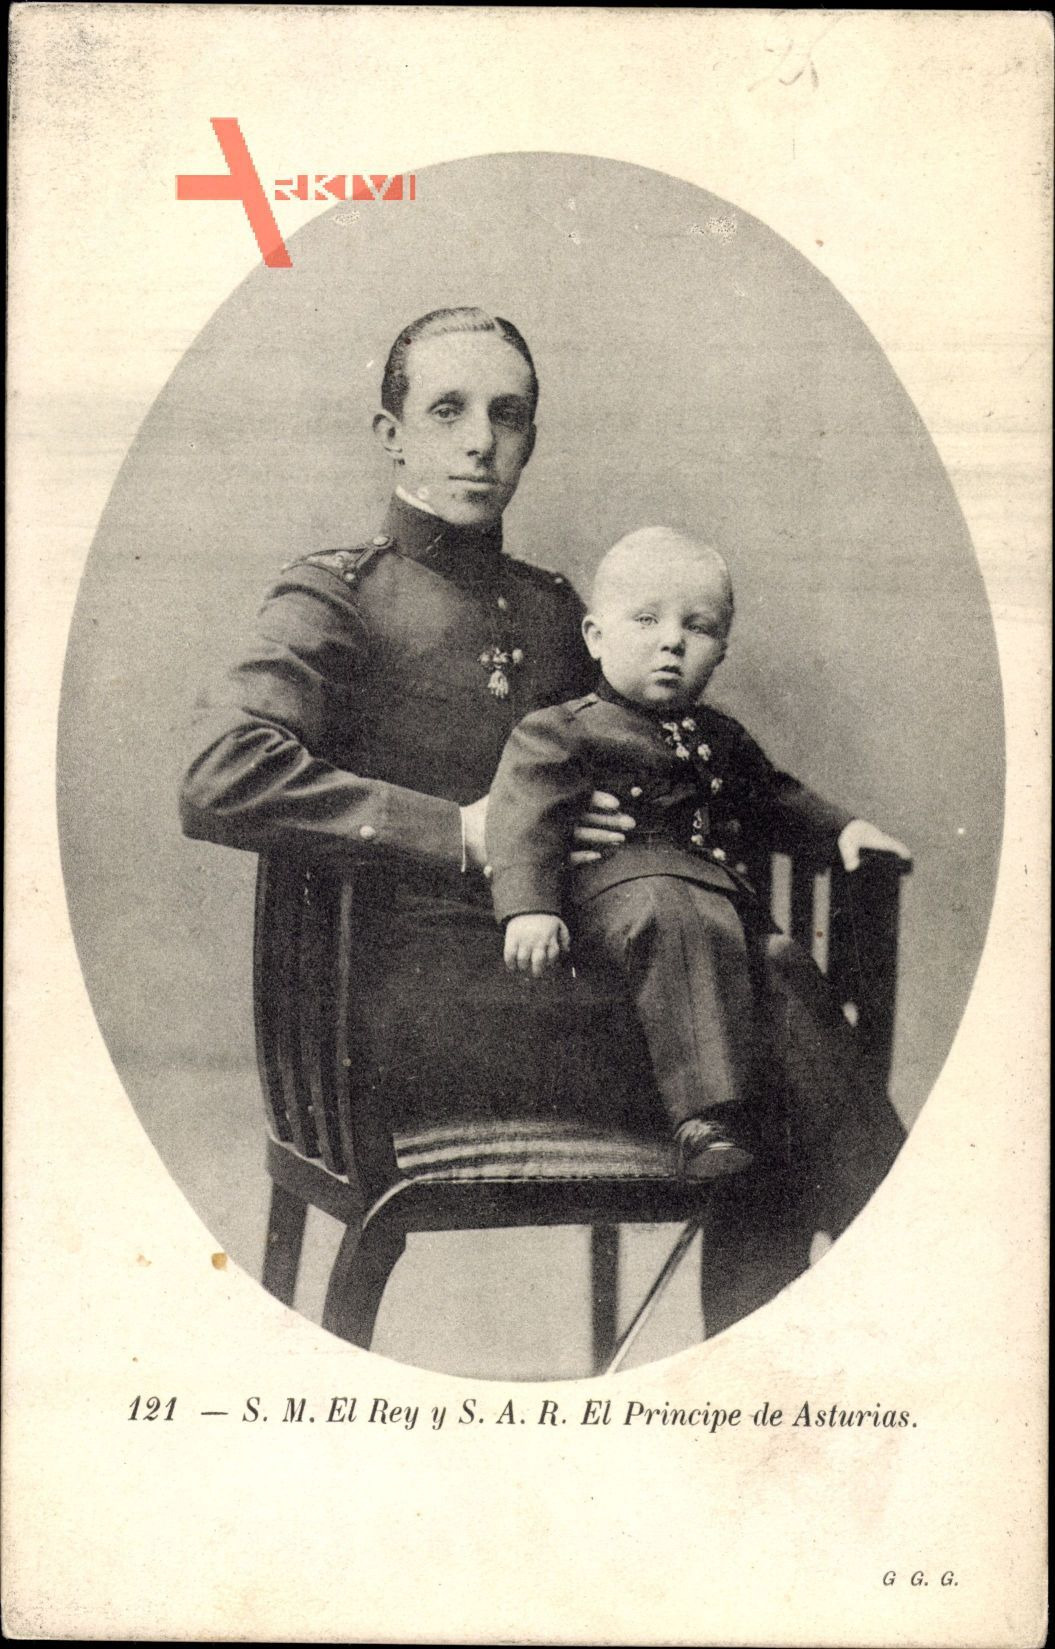 König Alfons XIII. von Spanien, Principe de Asturias